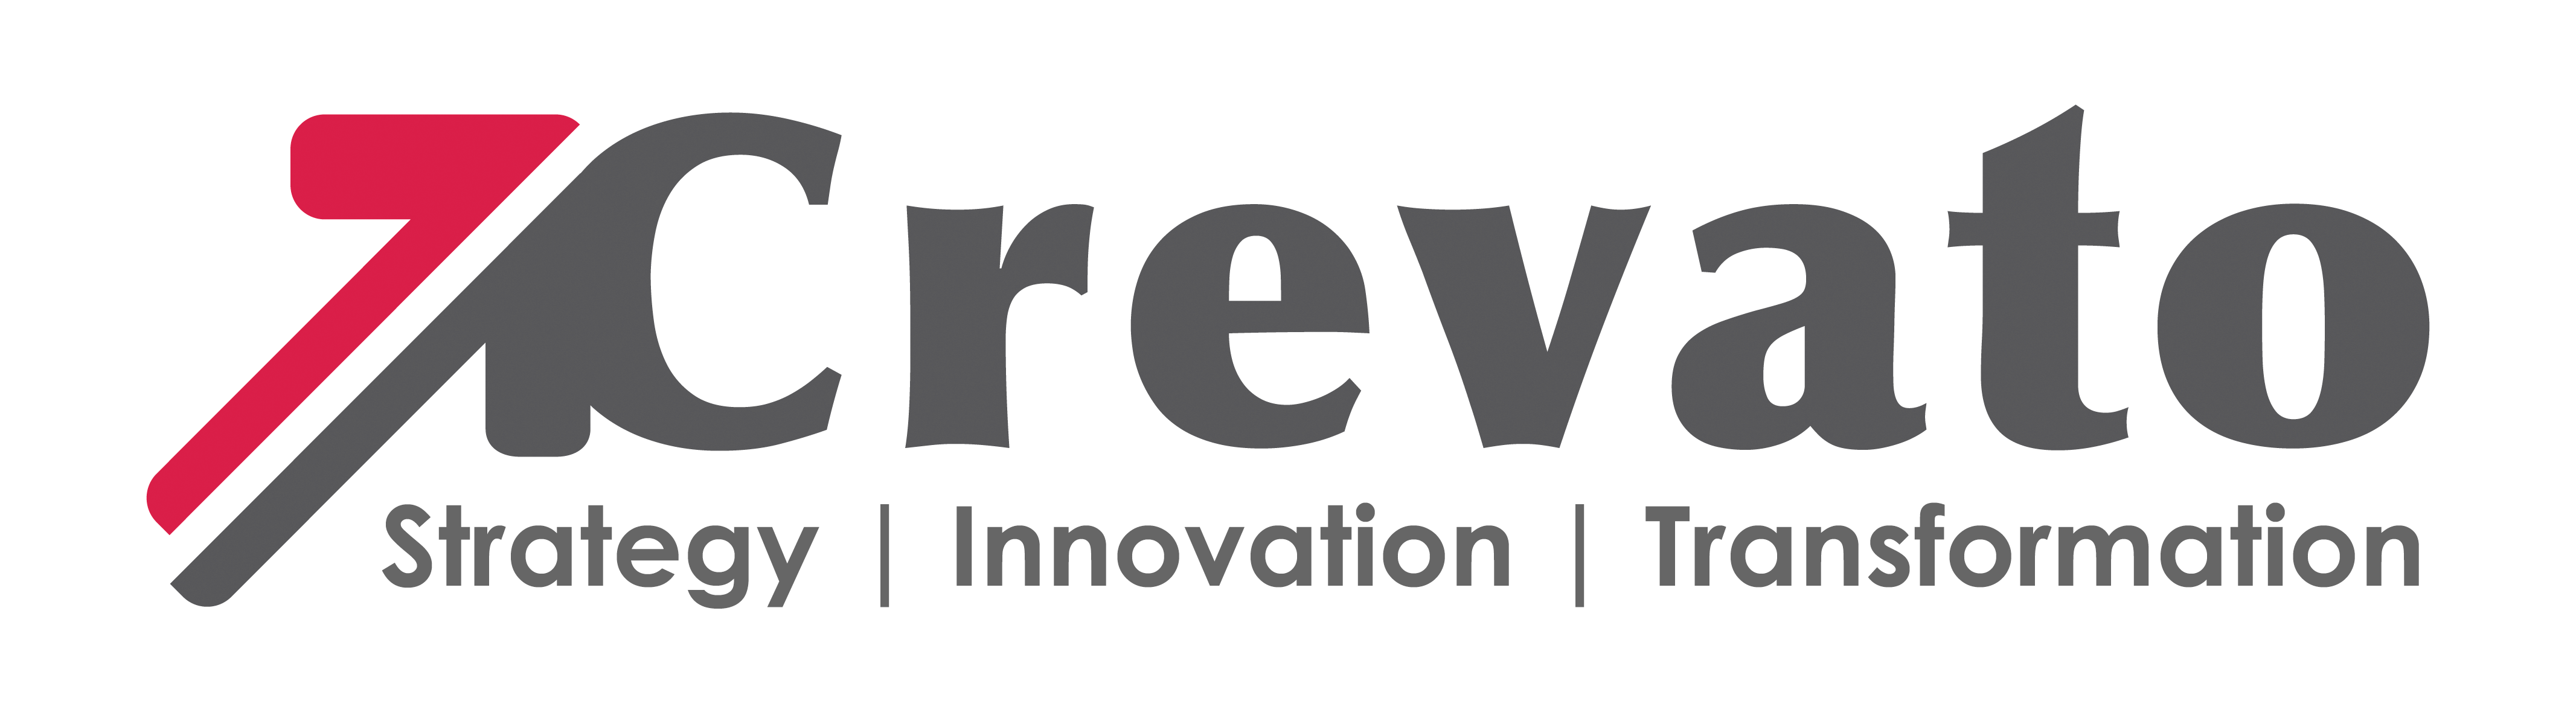 Crevato logo